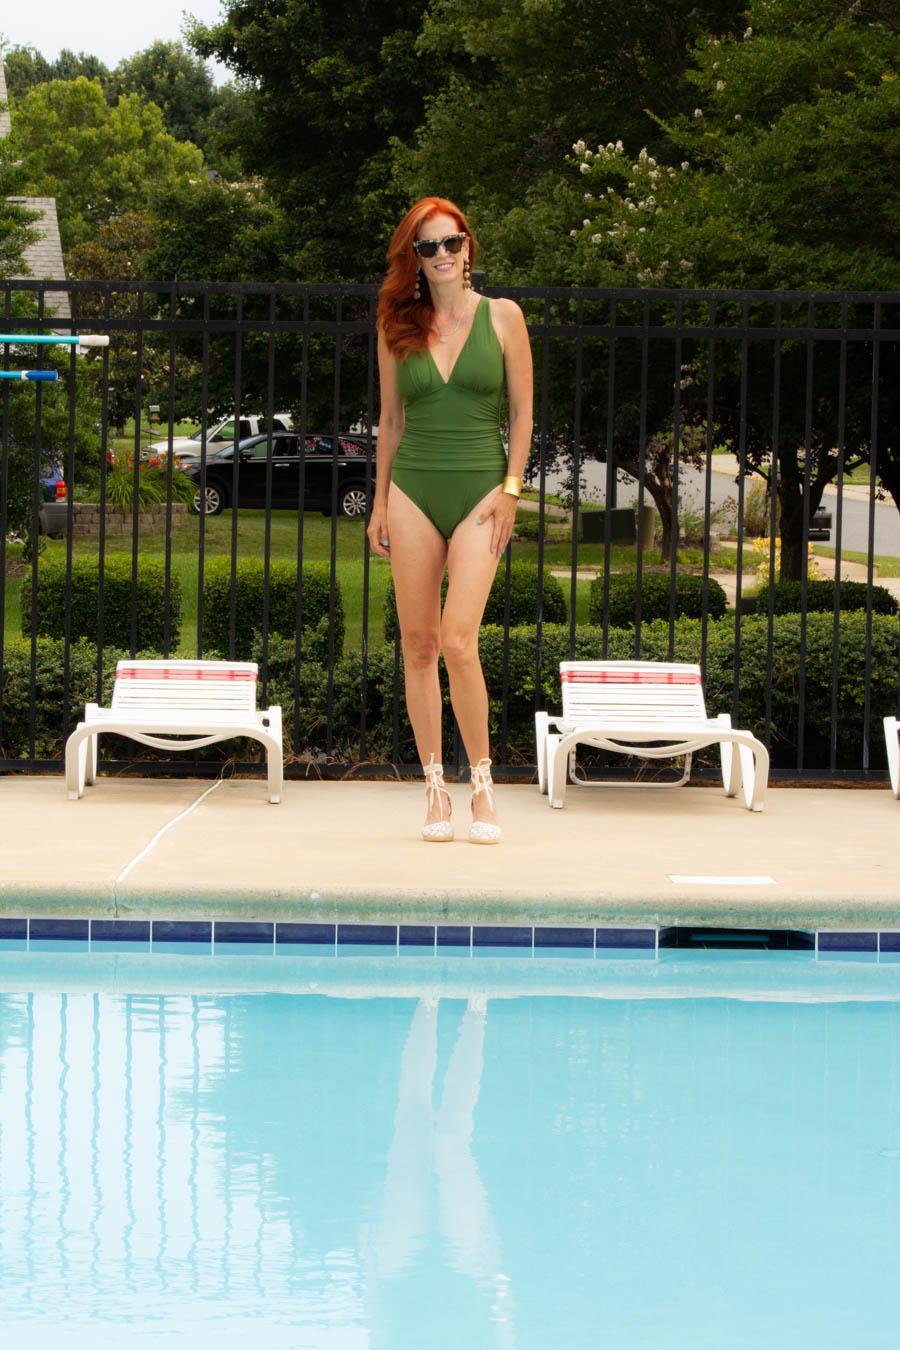 Swimspot green one piece bathing suit